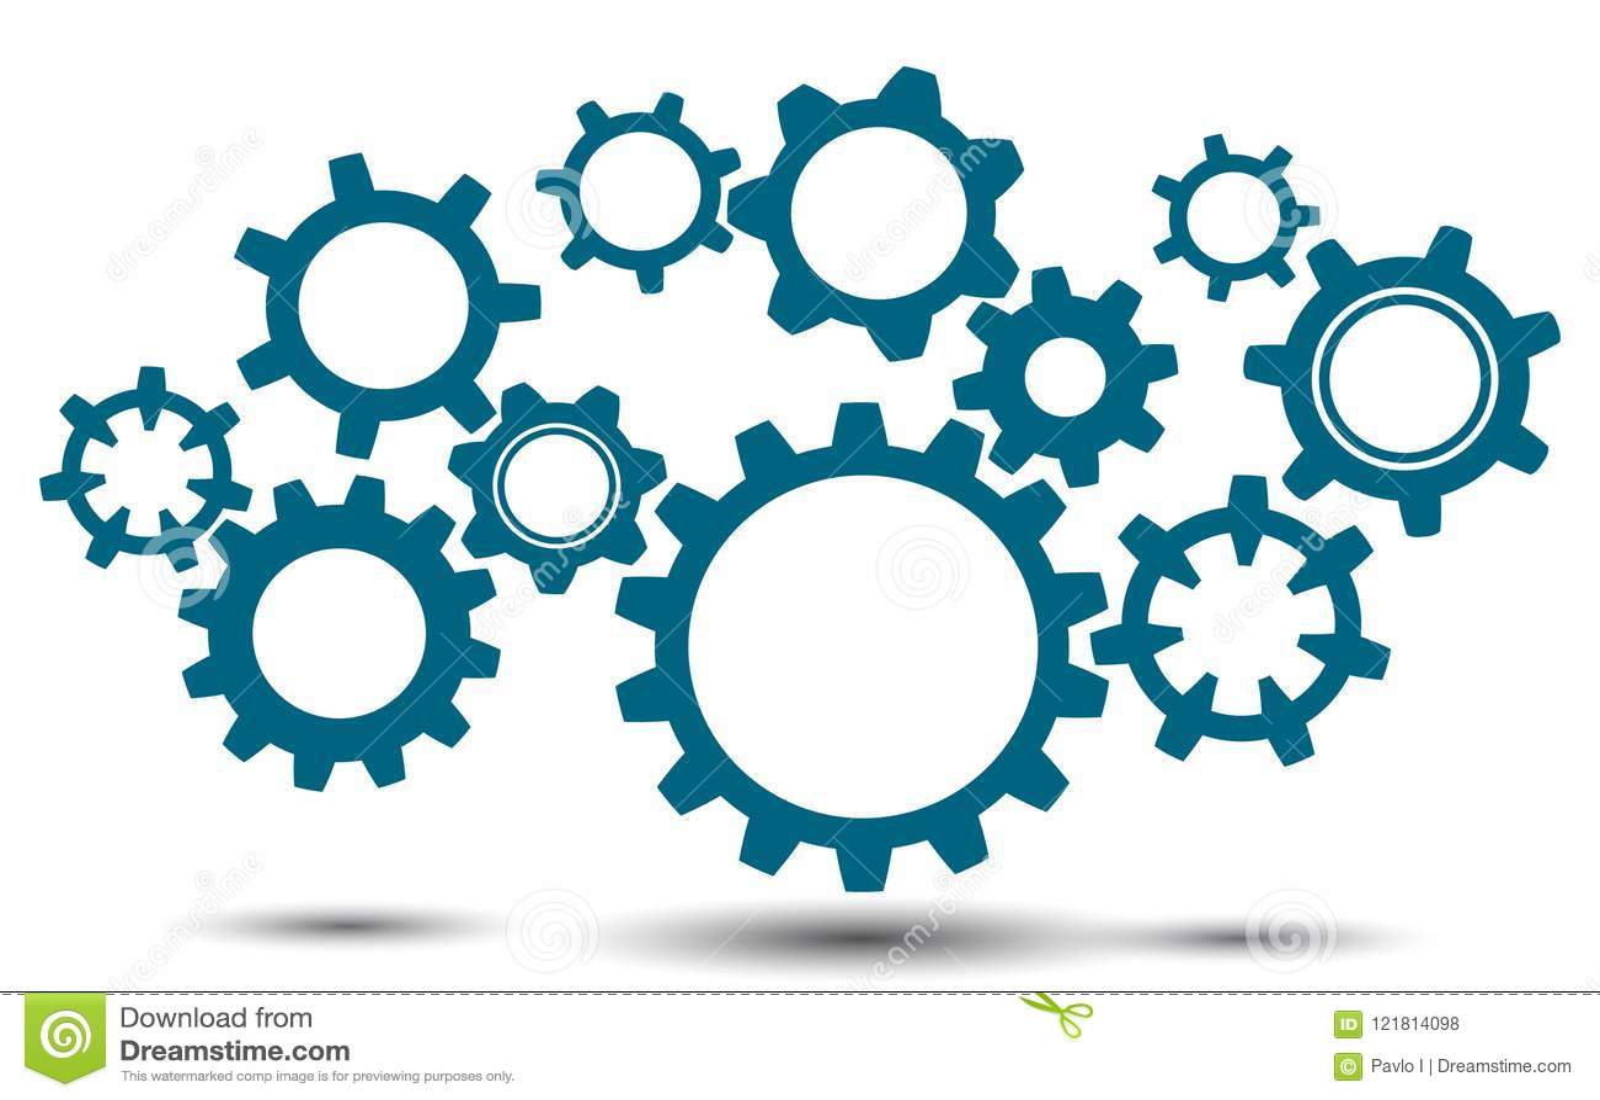 group gears, concept teamwork, generator business idea - vector